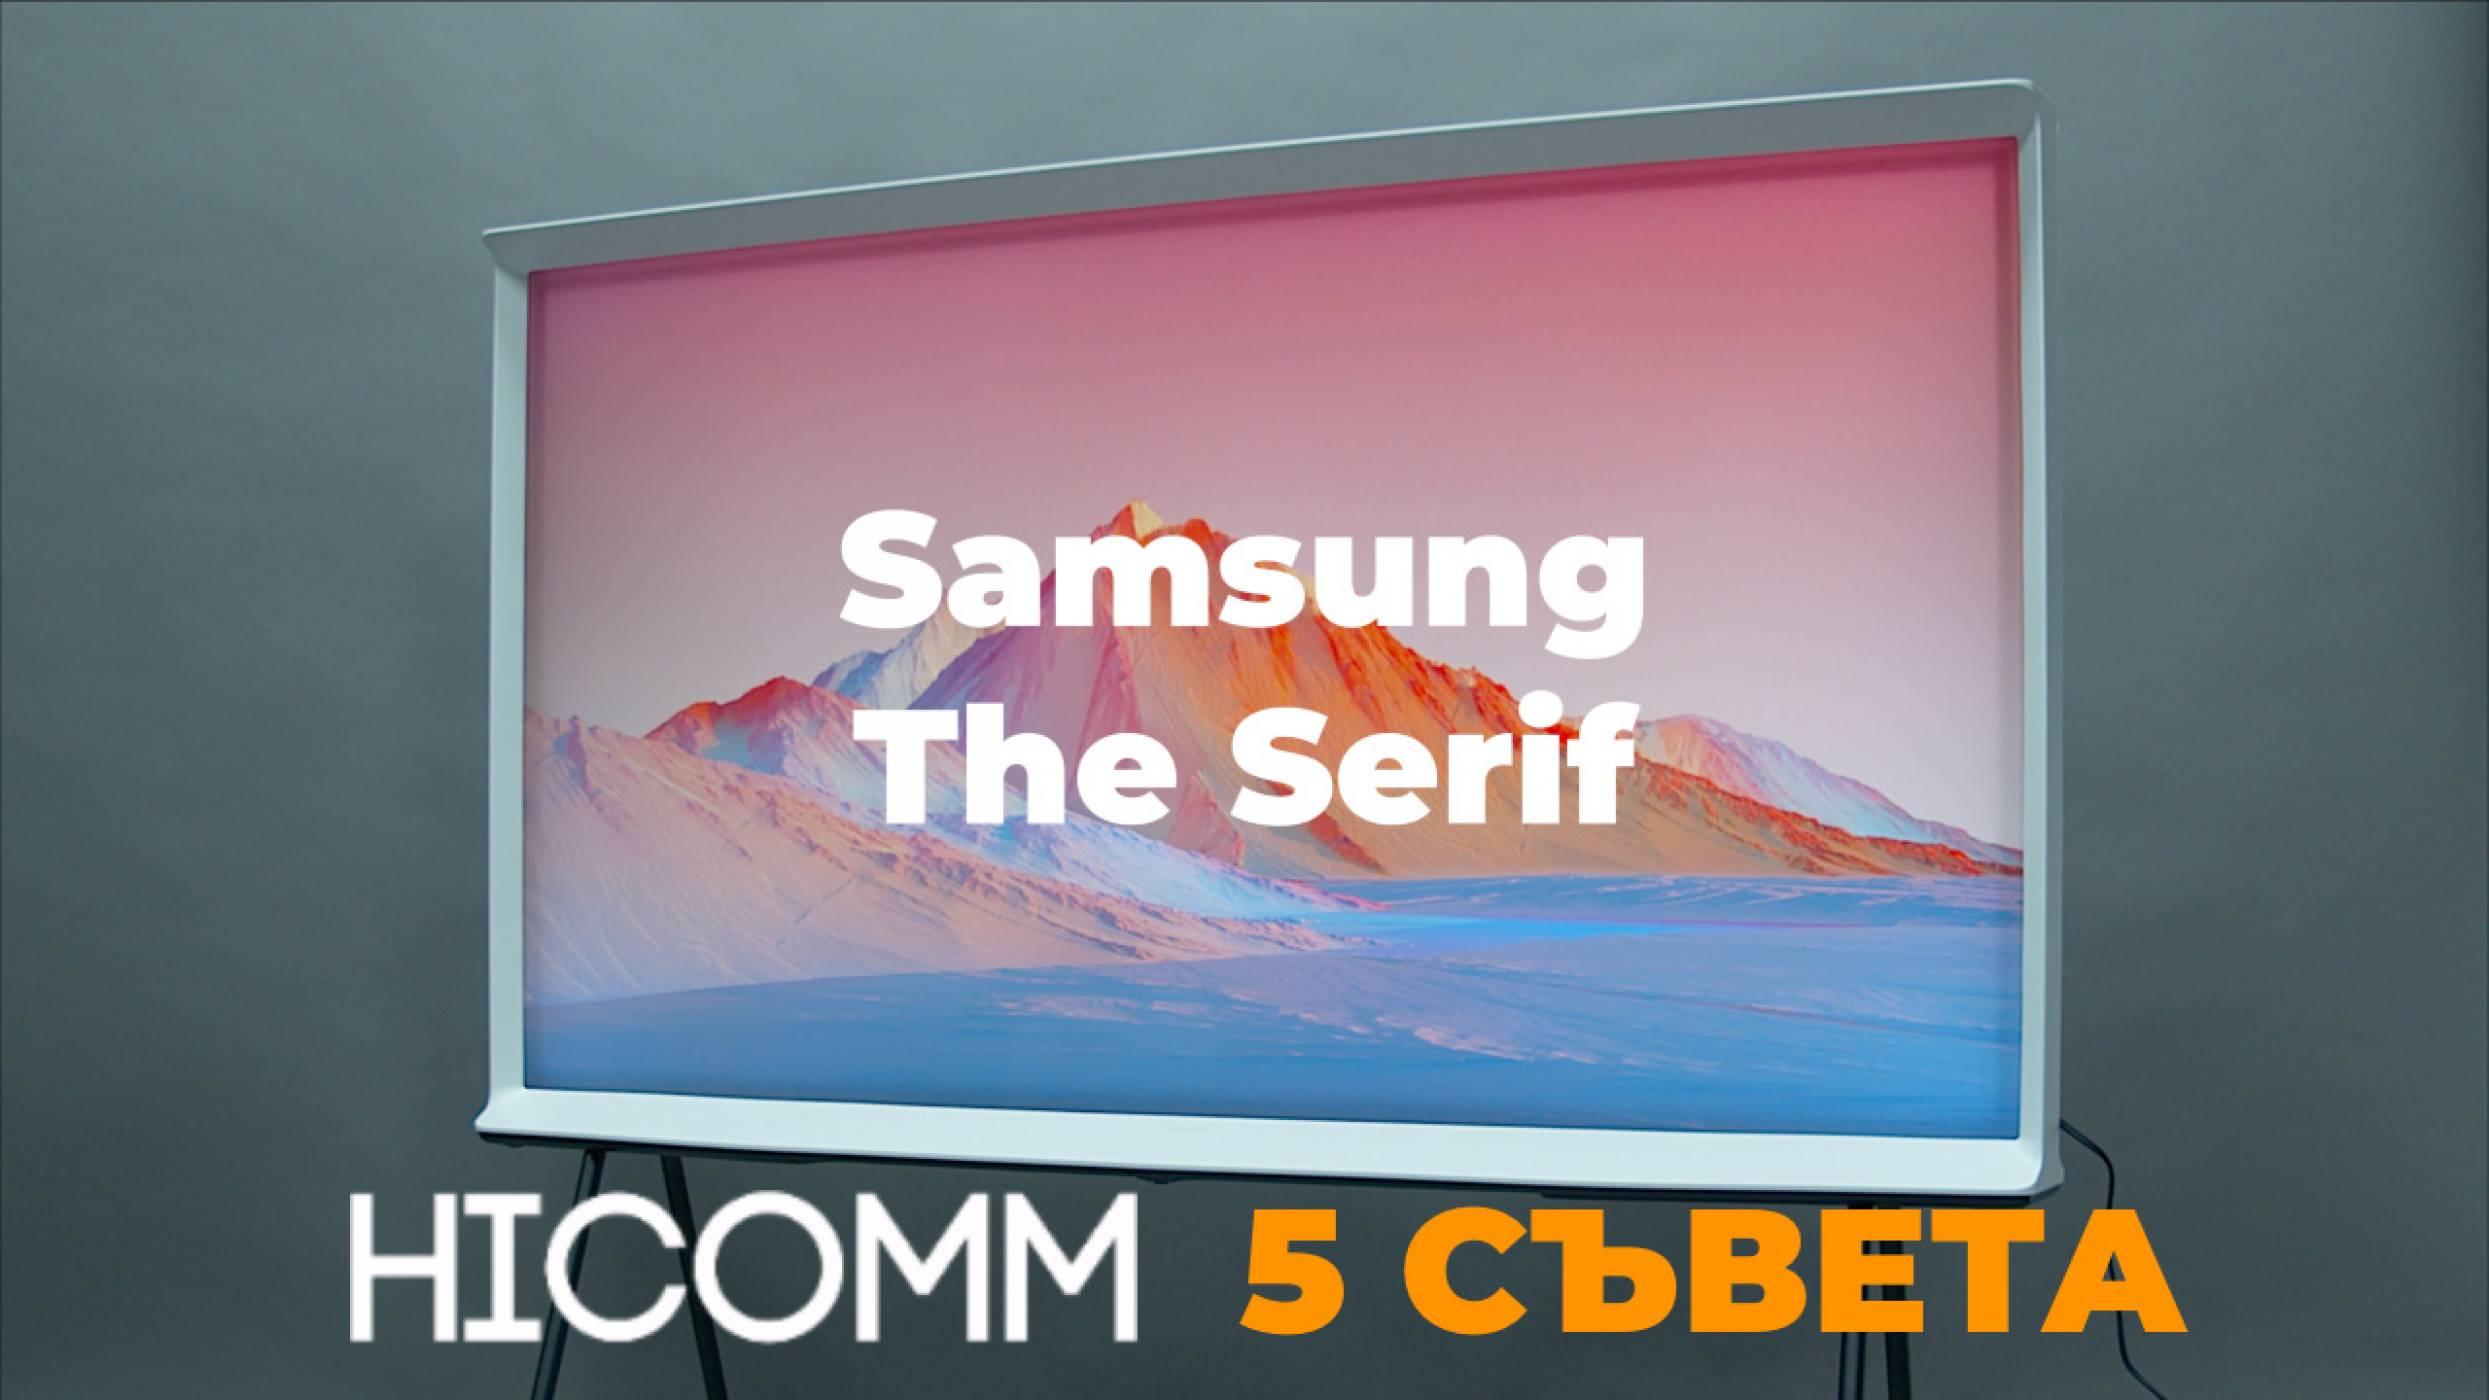 HICOMM 5 СЪВЕТА: Samsung The Serif (ВИДЕО)